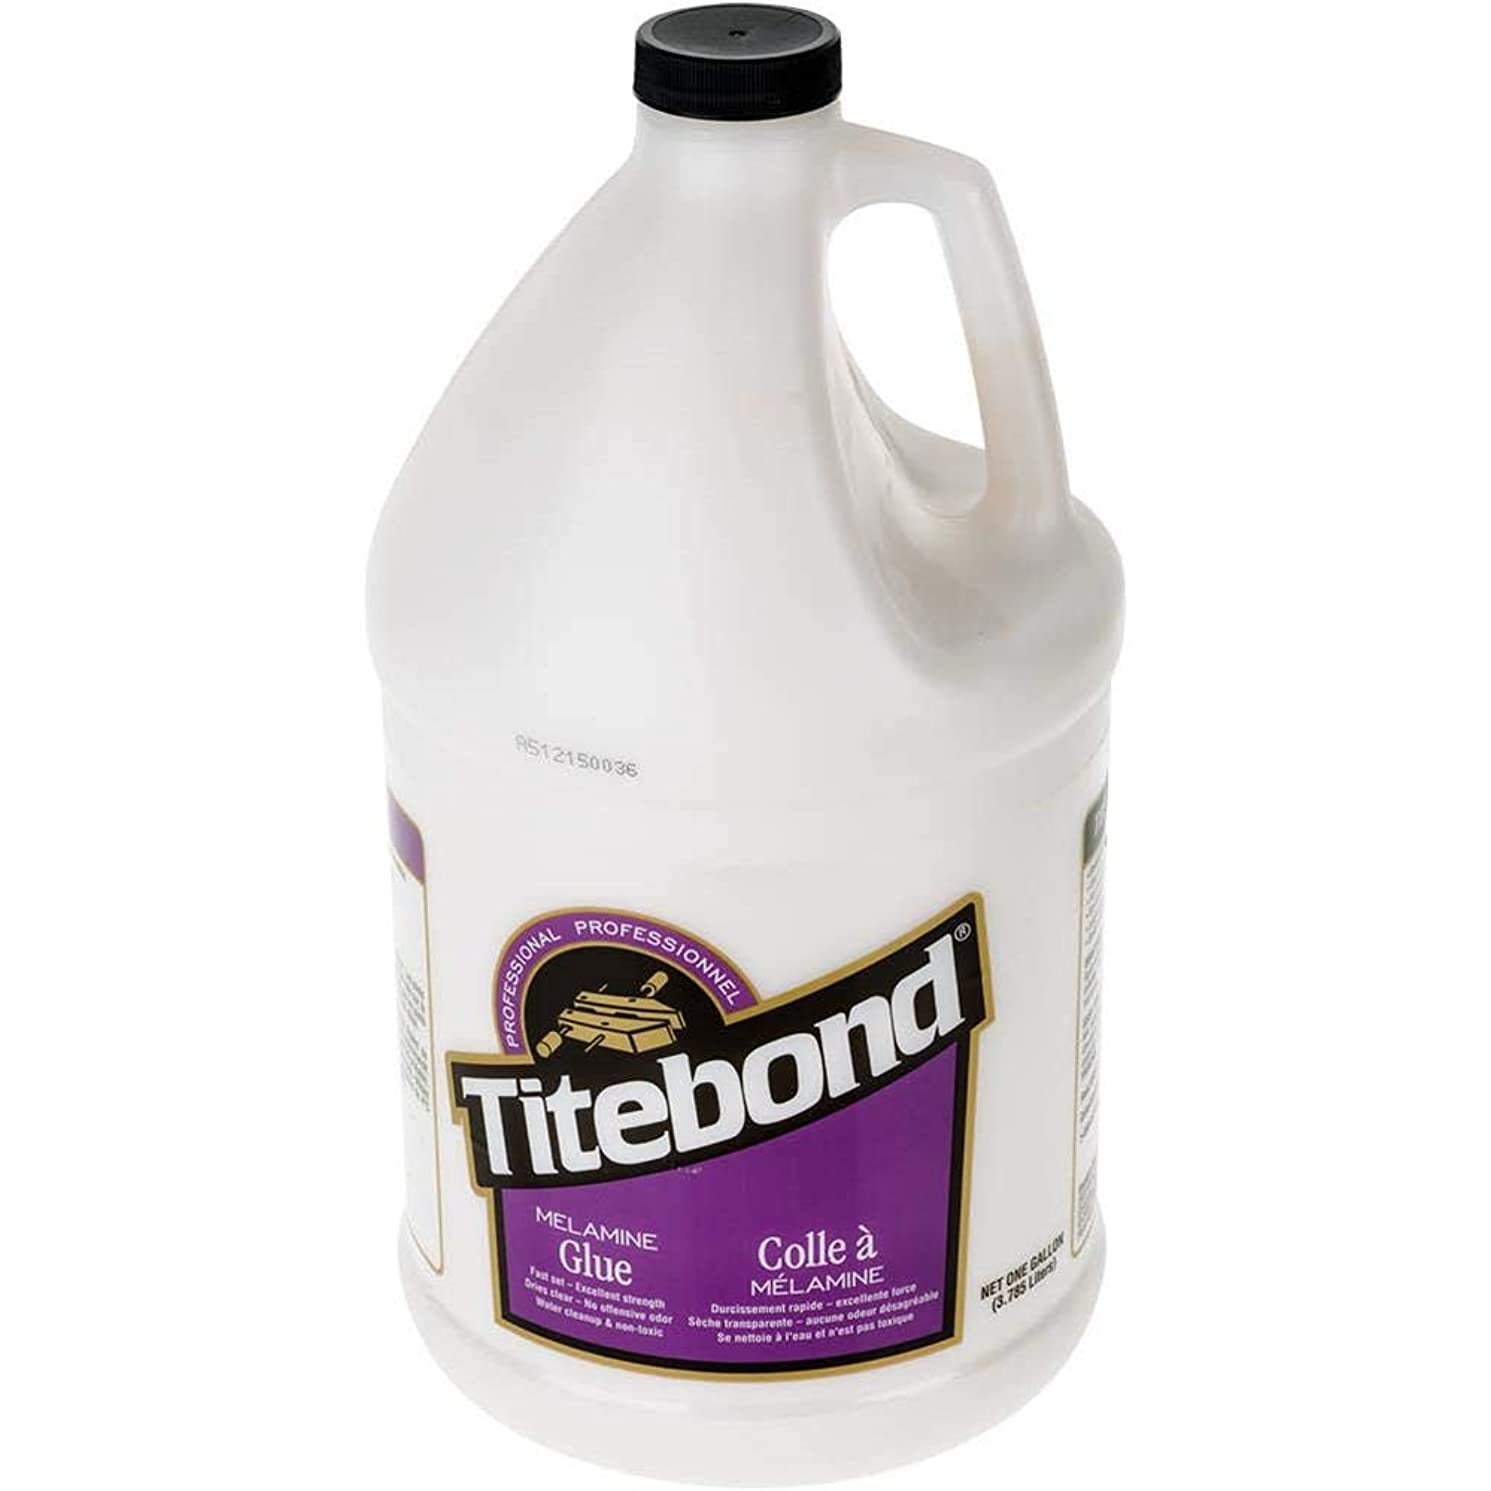 Titebond Glue, Melamine, 1 Gal, White